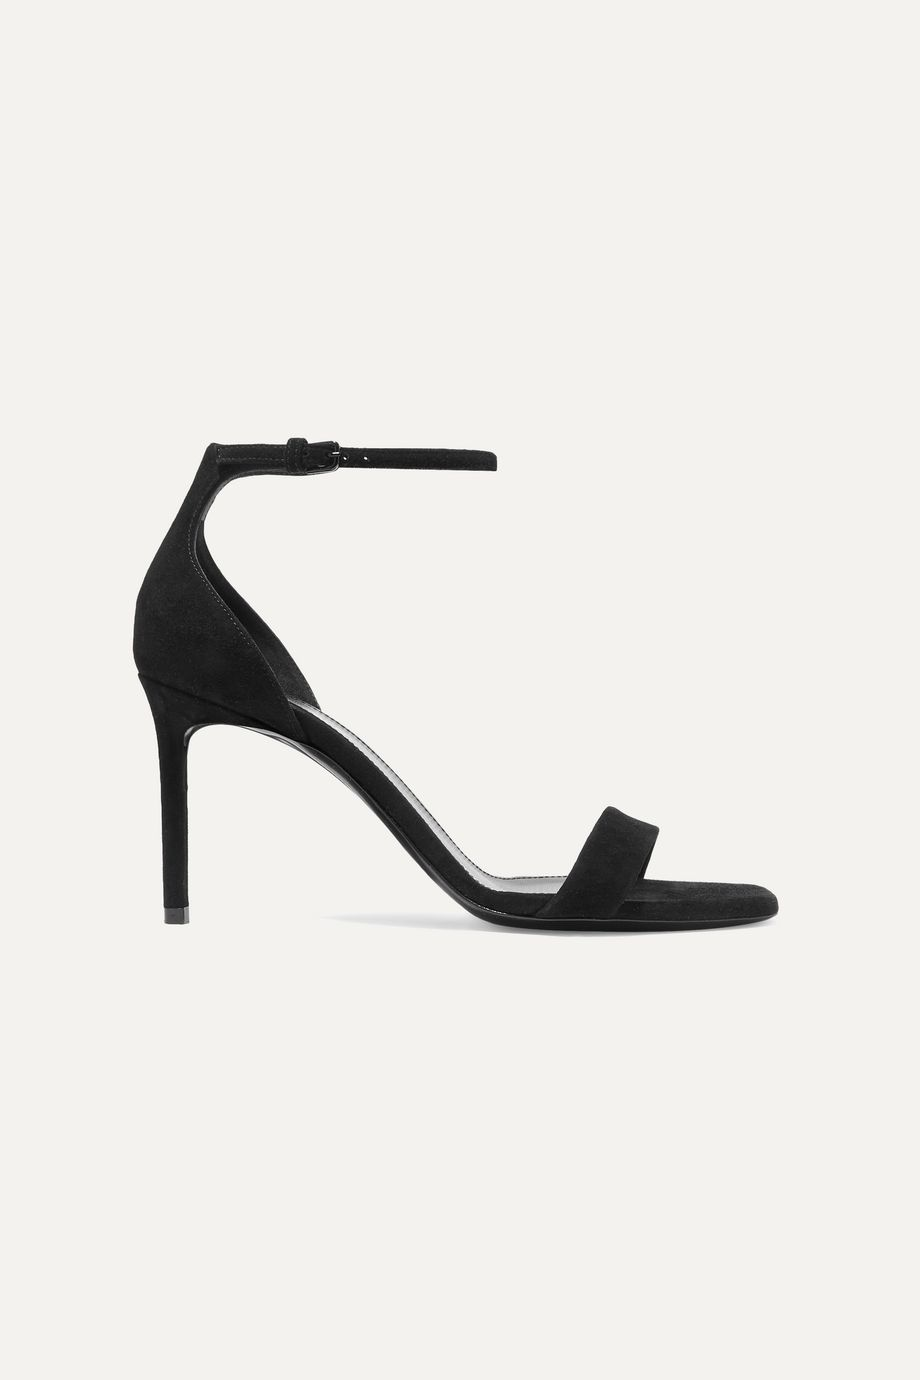 SAINT LAURENT Amber suede sandals